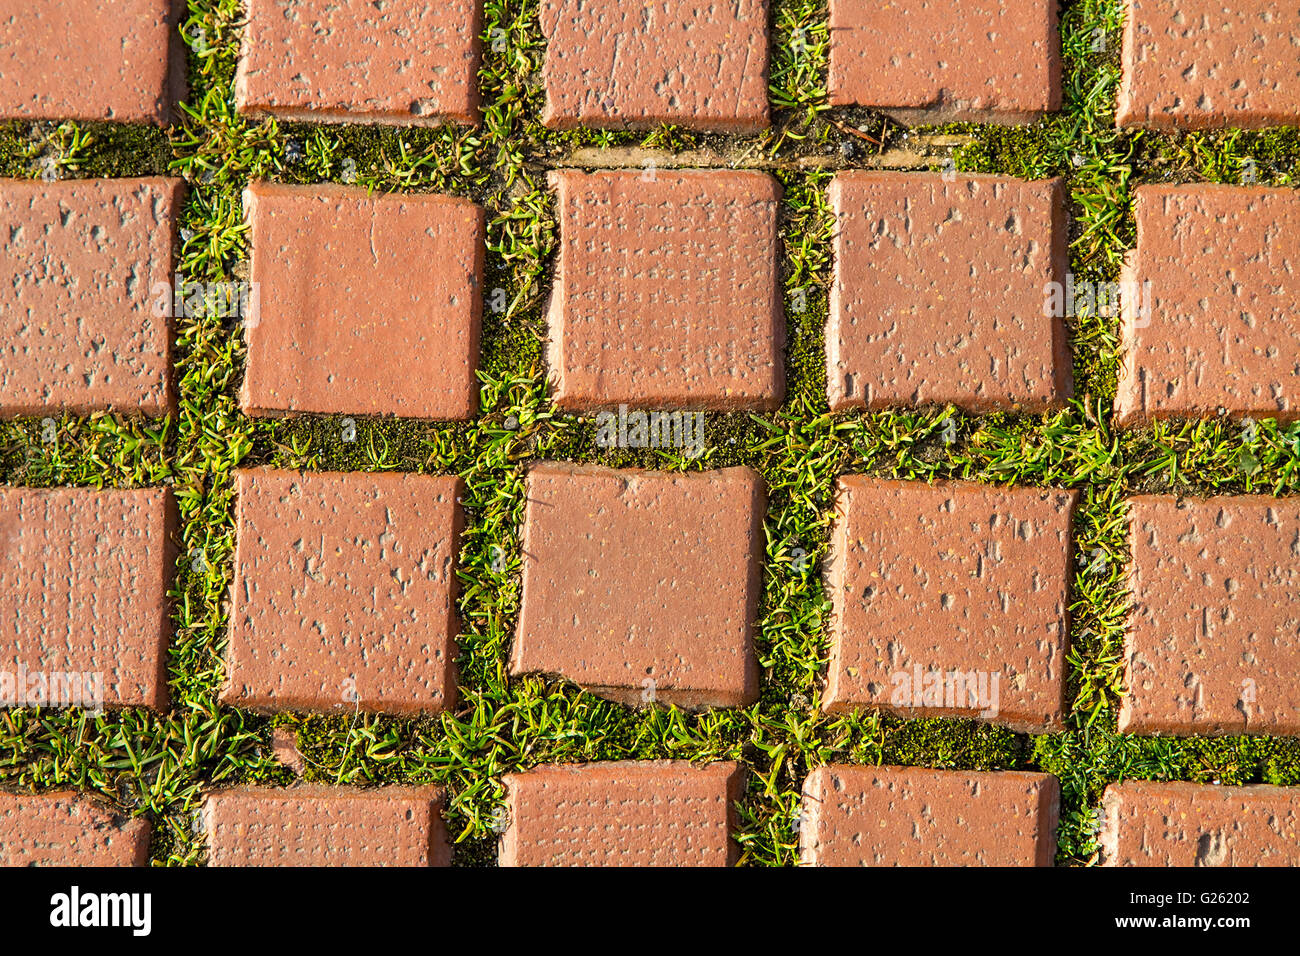 grass brick stone path texture green pavement sidewalk floor paving background road block garden pattern nature - Stock Image